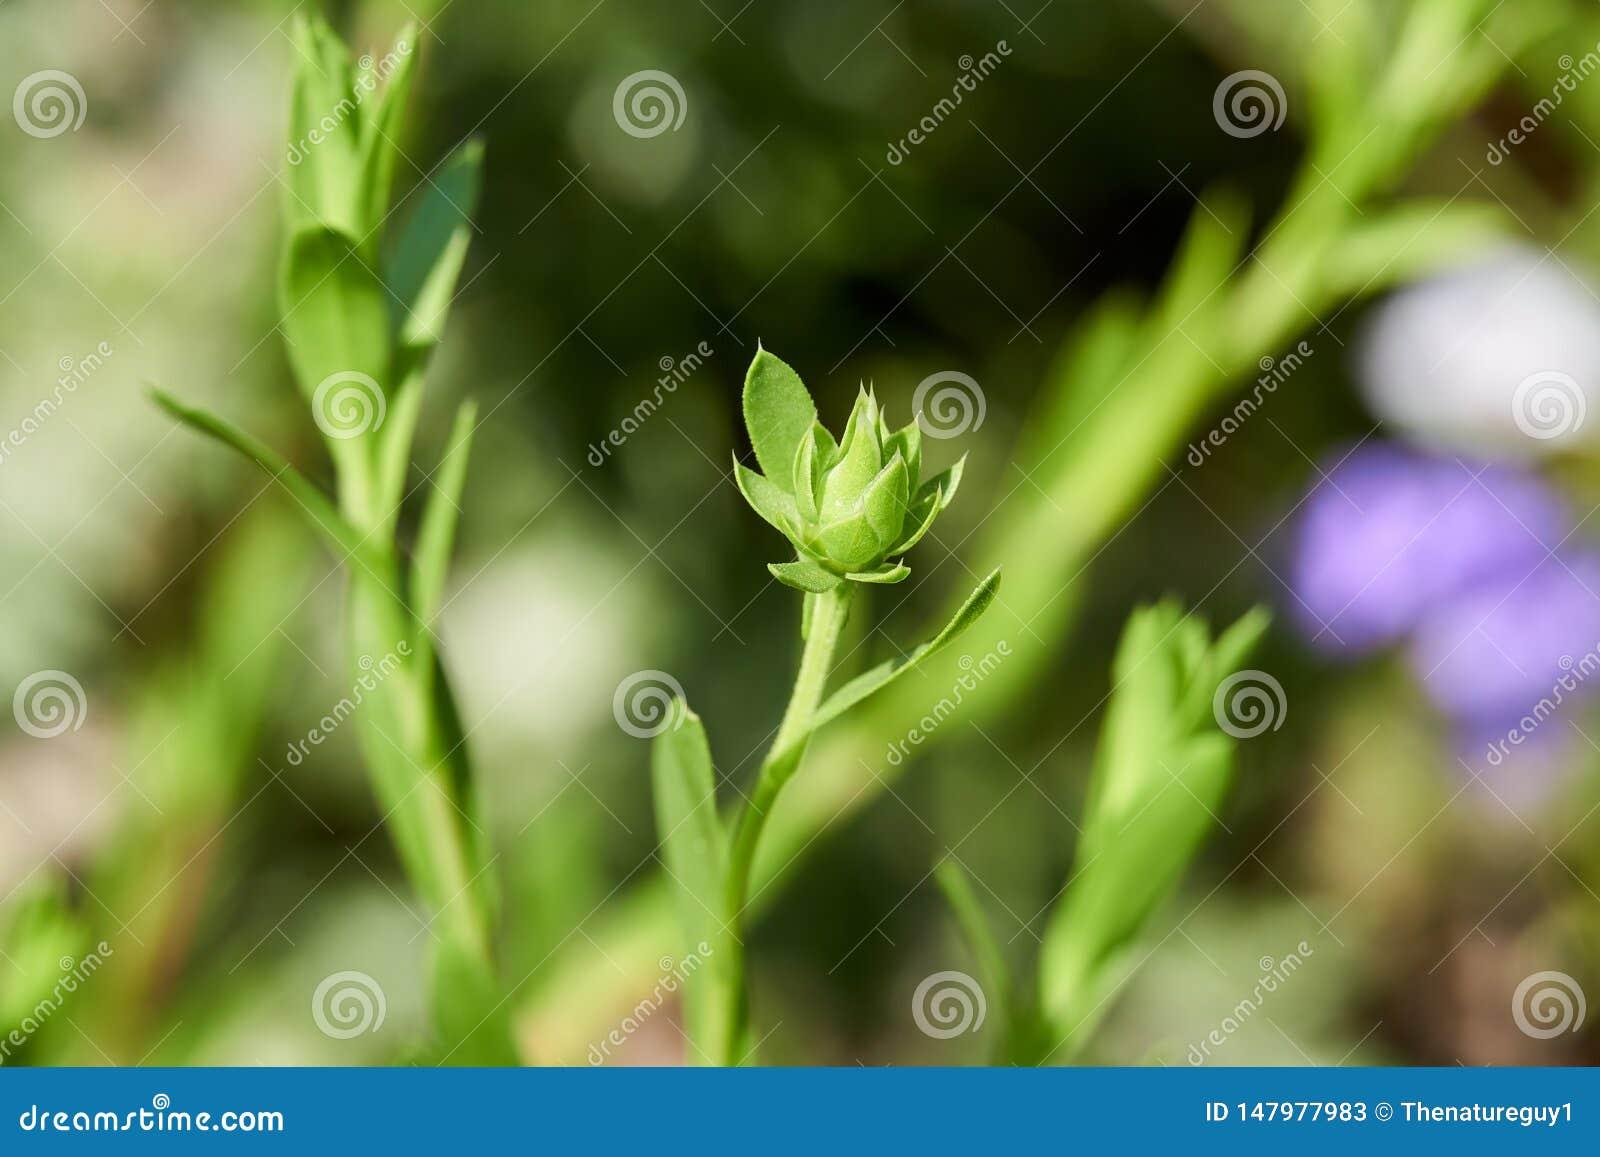 Macro Close up of Texas Sleepydaisy Xanthisma texanum prebloom flower bud.